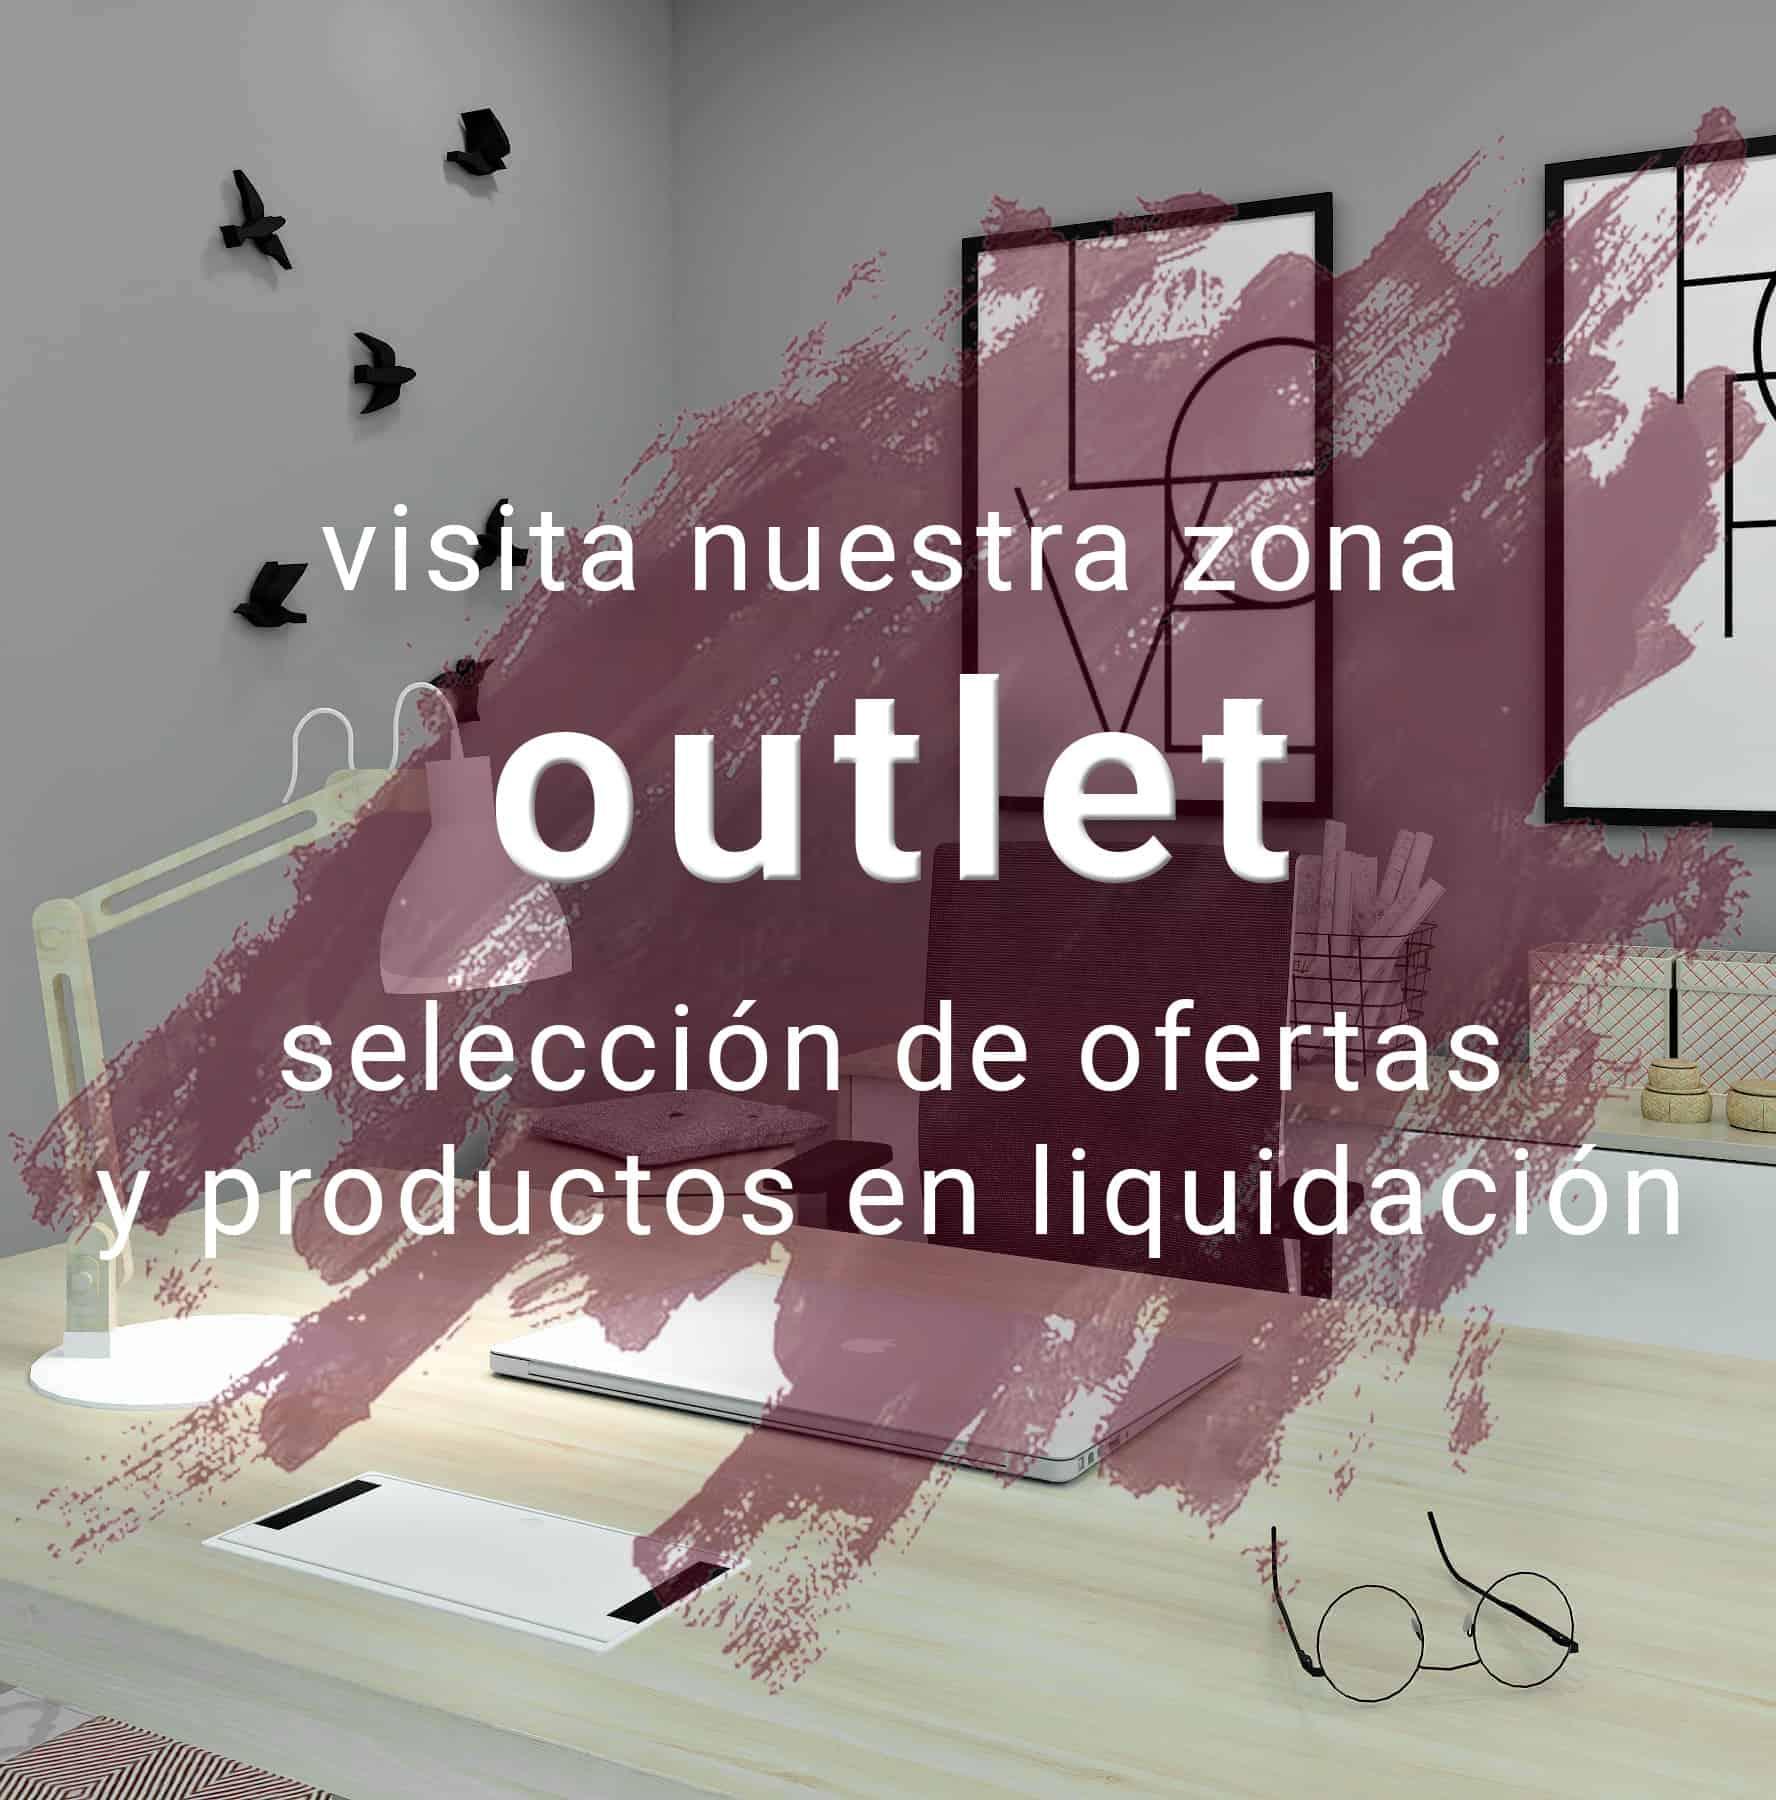 ofertas-productos-liquidacion-outlet